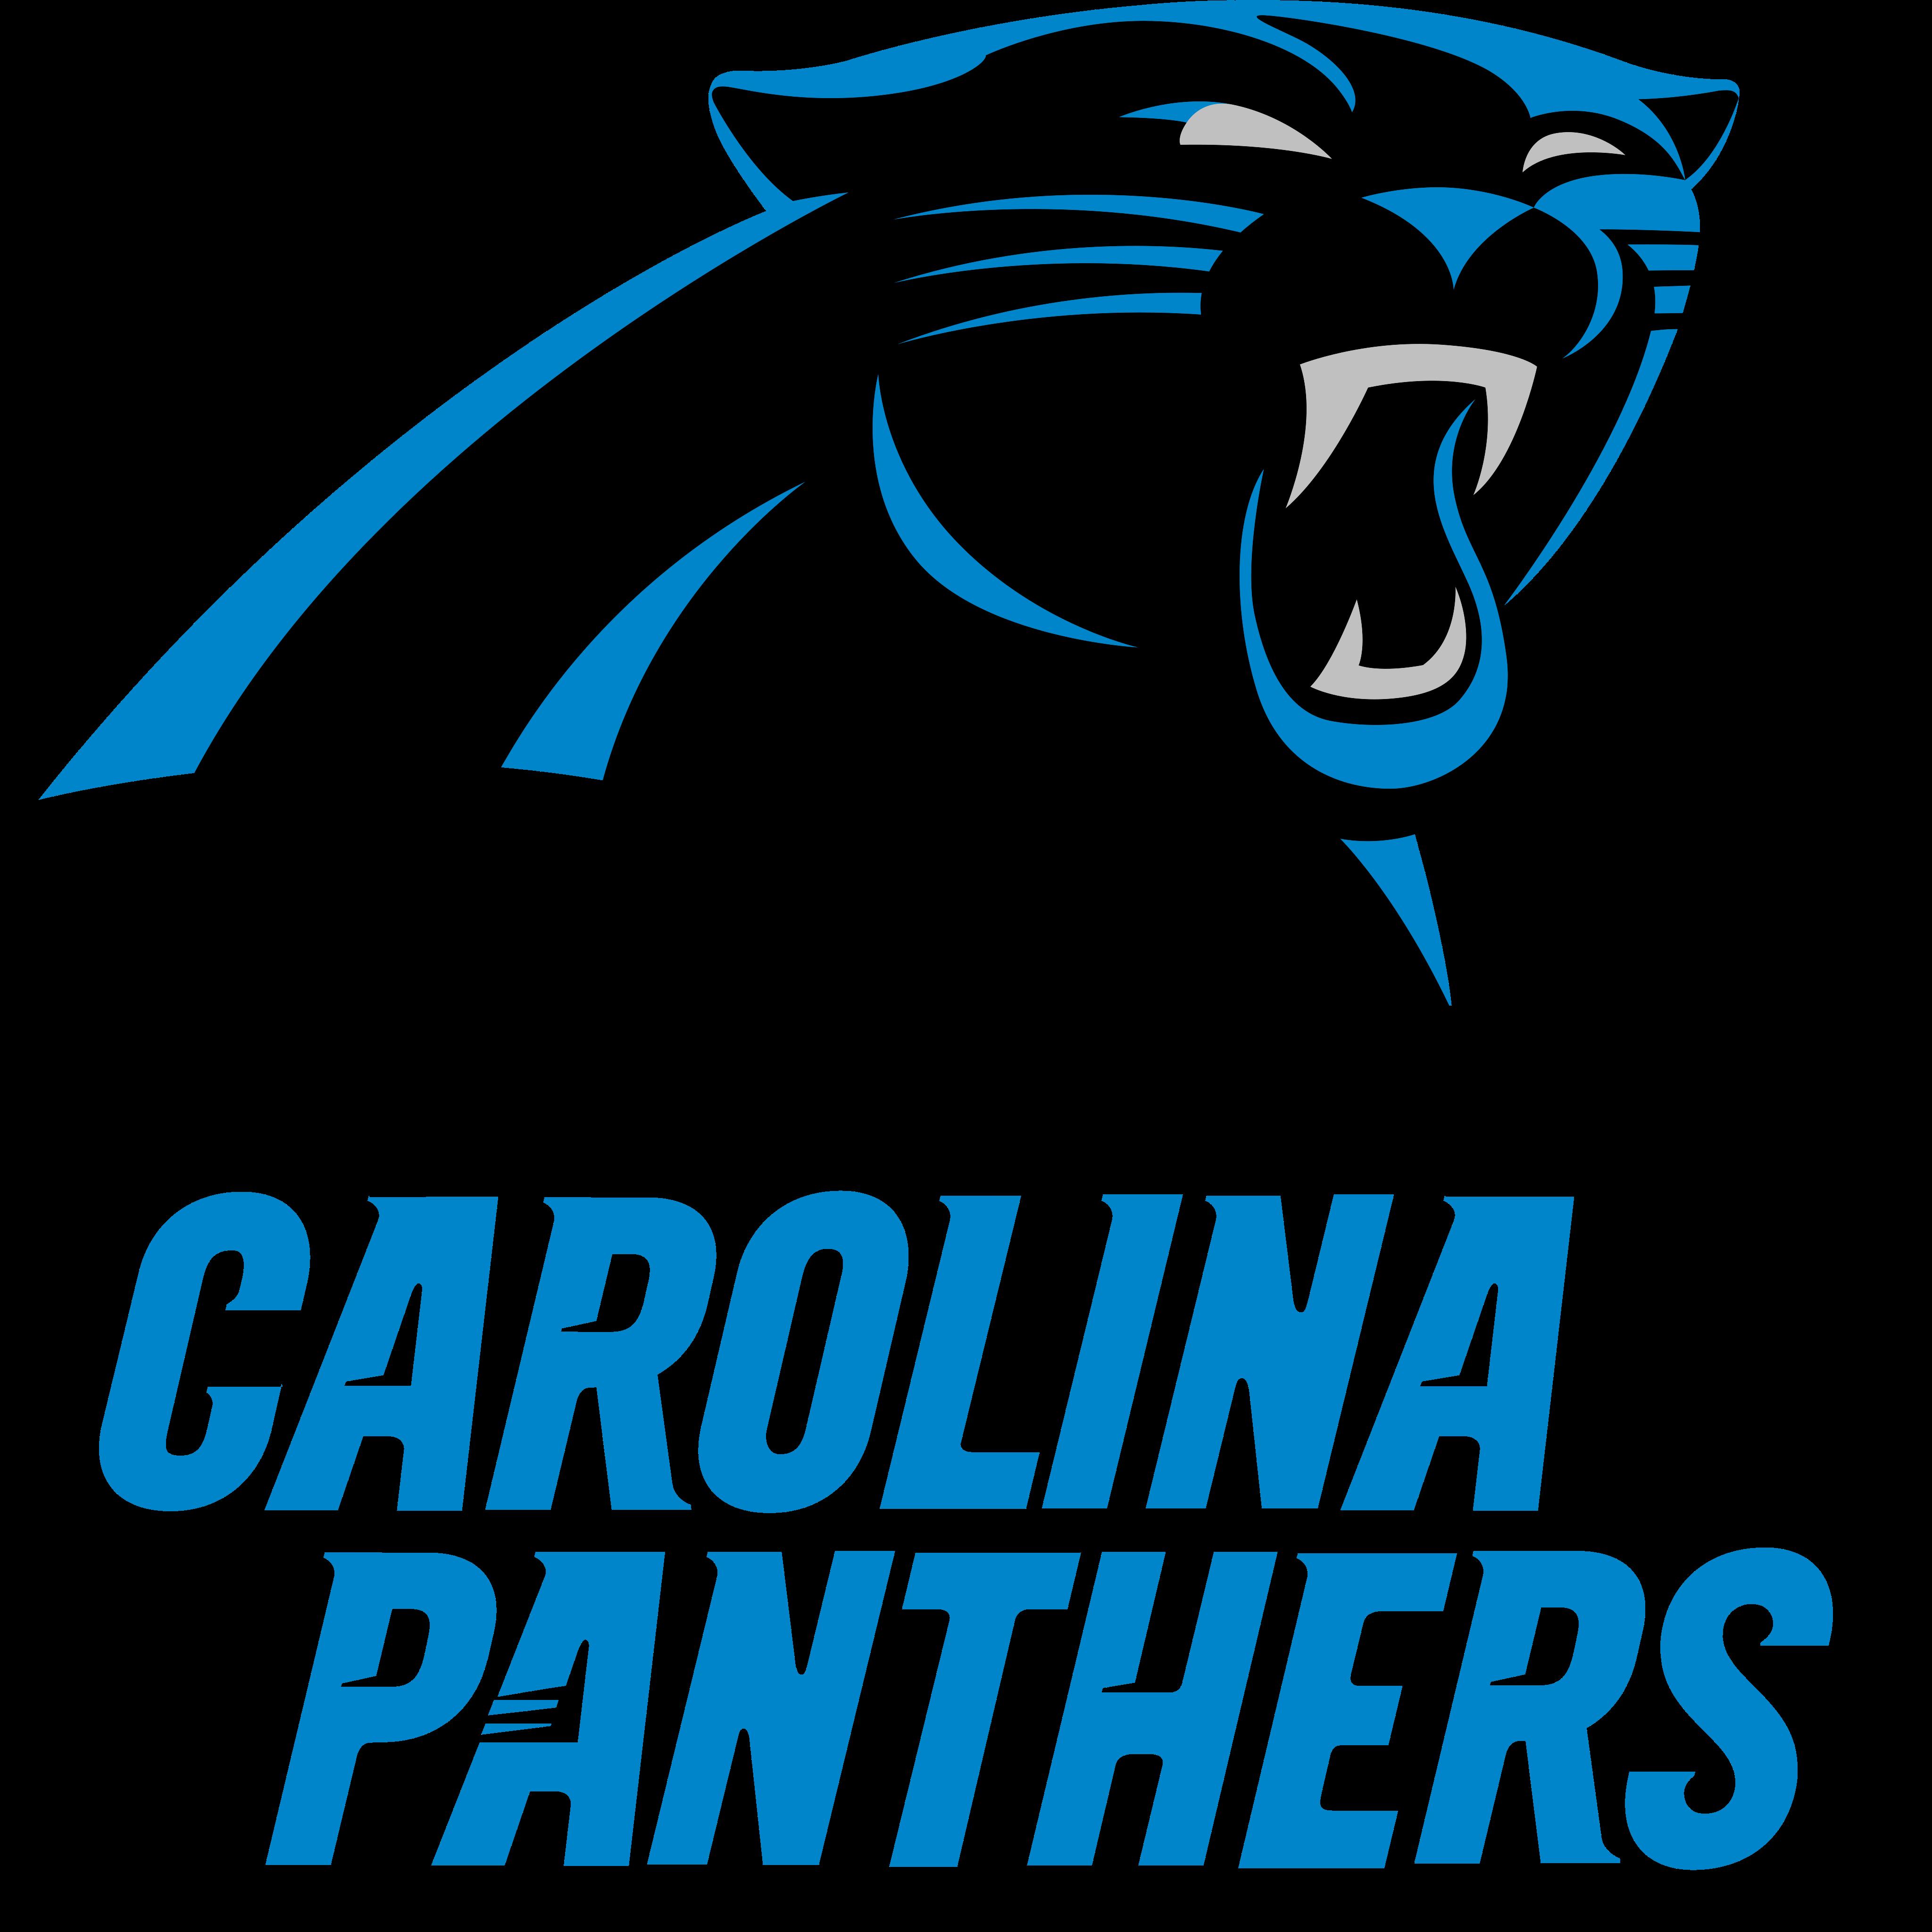 carolina panthers logo 1 - Carolina Panthers Logo